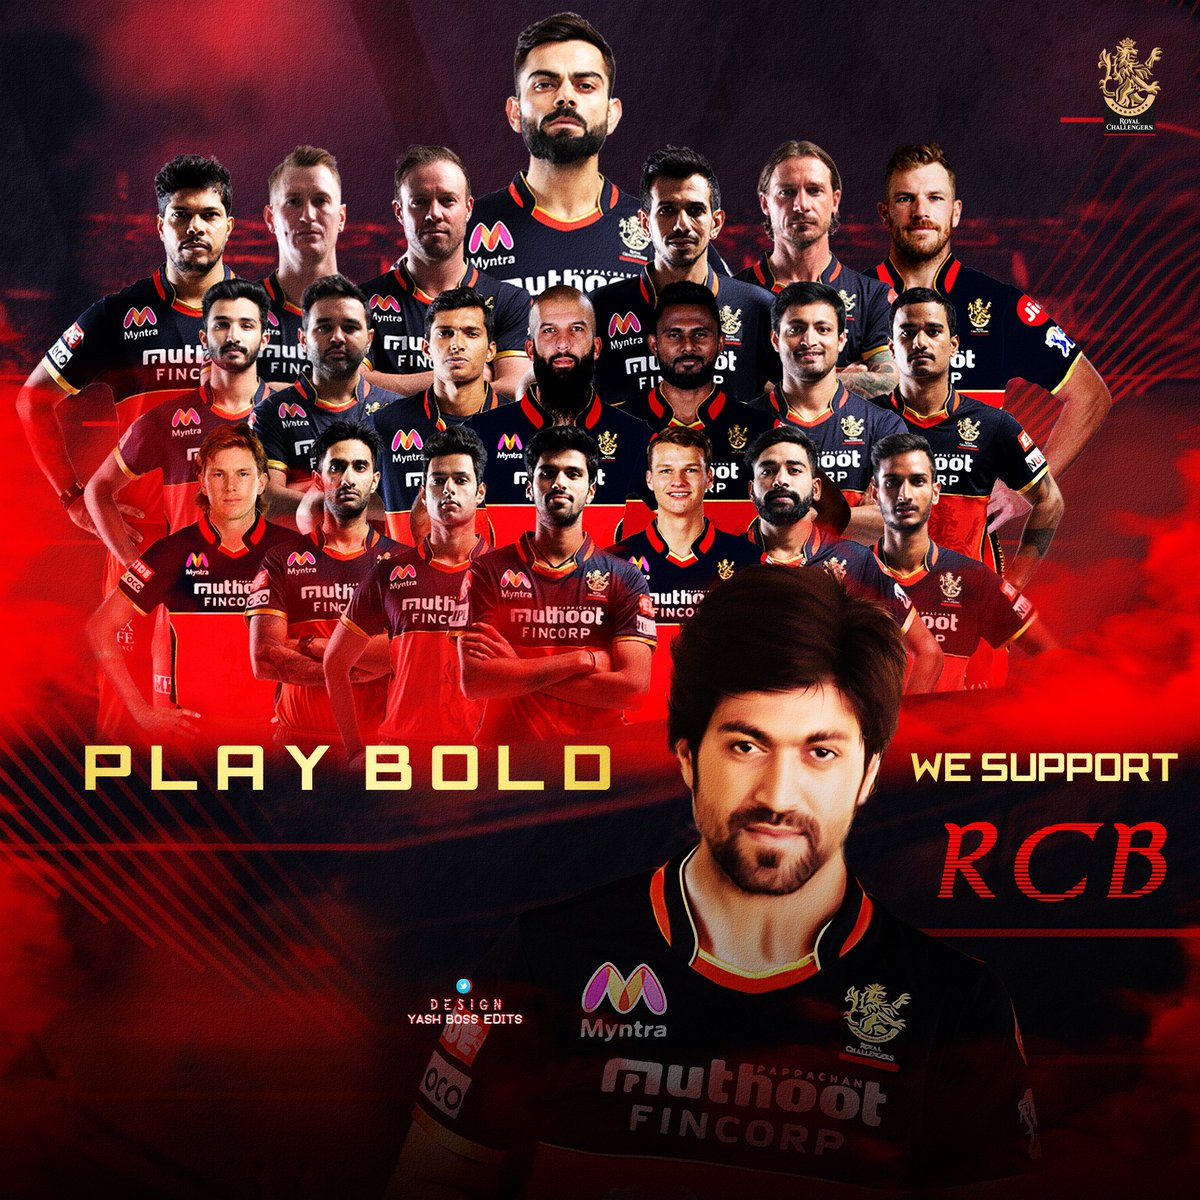 All the best @RCBTweets @imVkohli 💪  Best wishes from @TheNameIsYash BOSS FANS ❤  #PlayBold #WeAreChallengers #IPL2020  #KGFChapter2 https://t.co/bjETzwGZxs